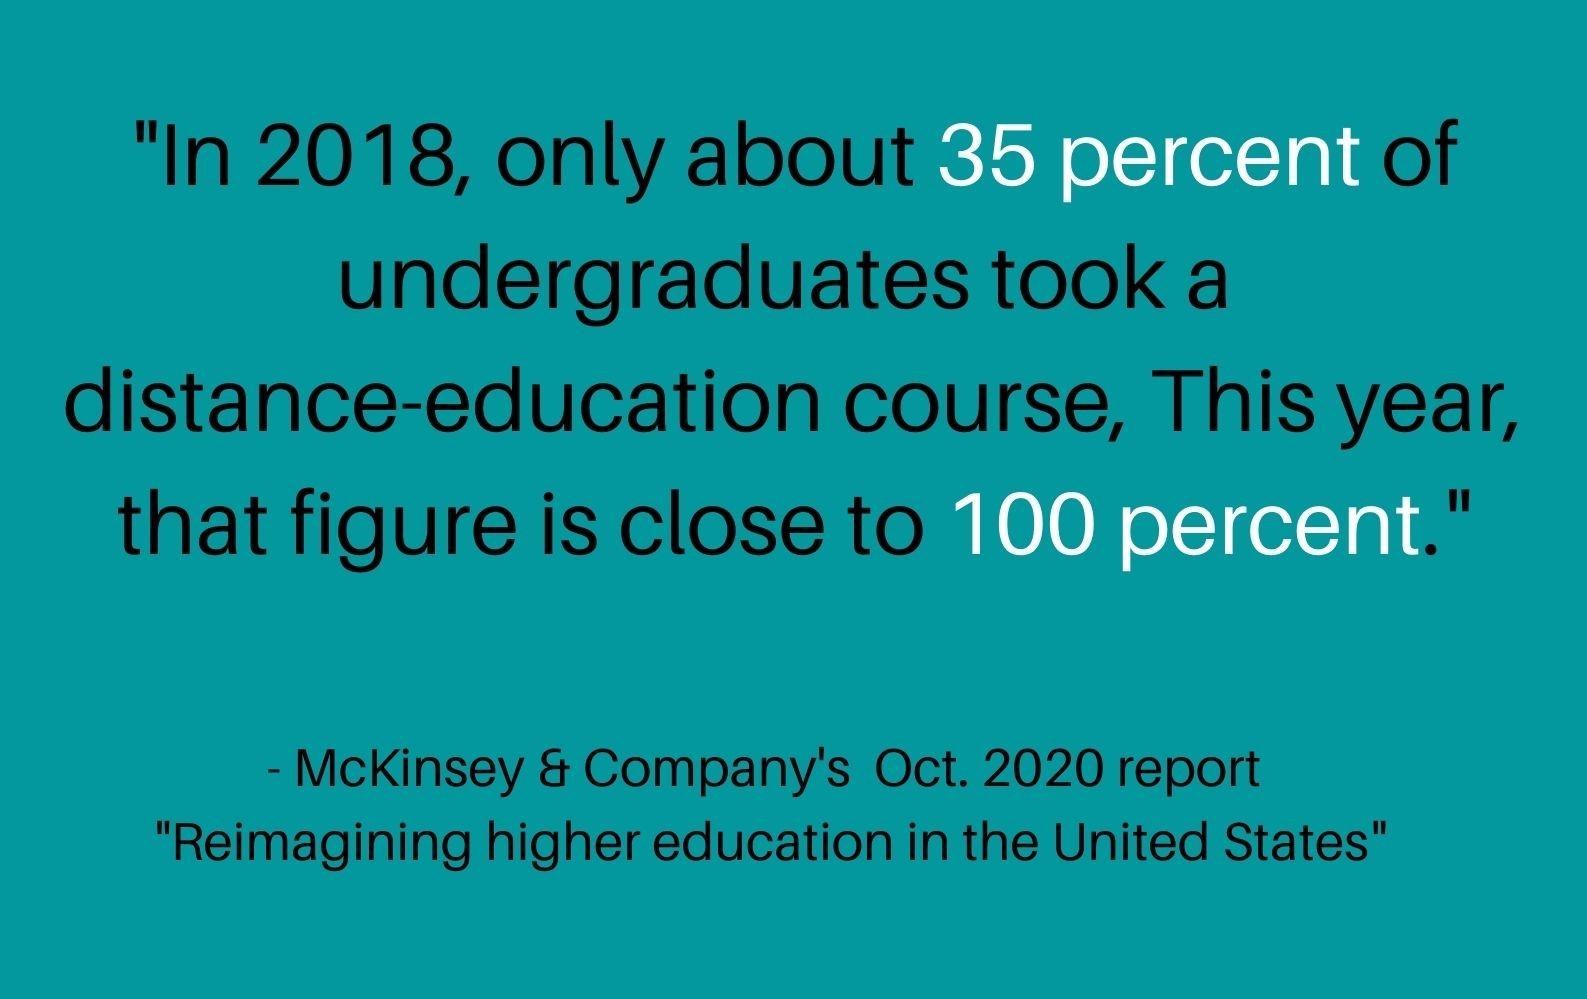 McKinsey & Company's Oct 2020 report